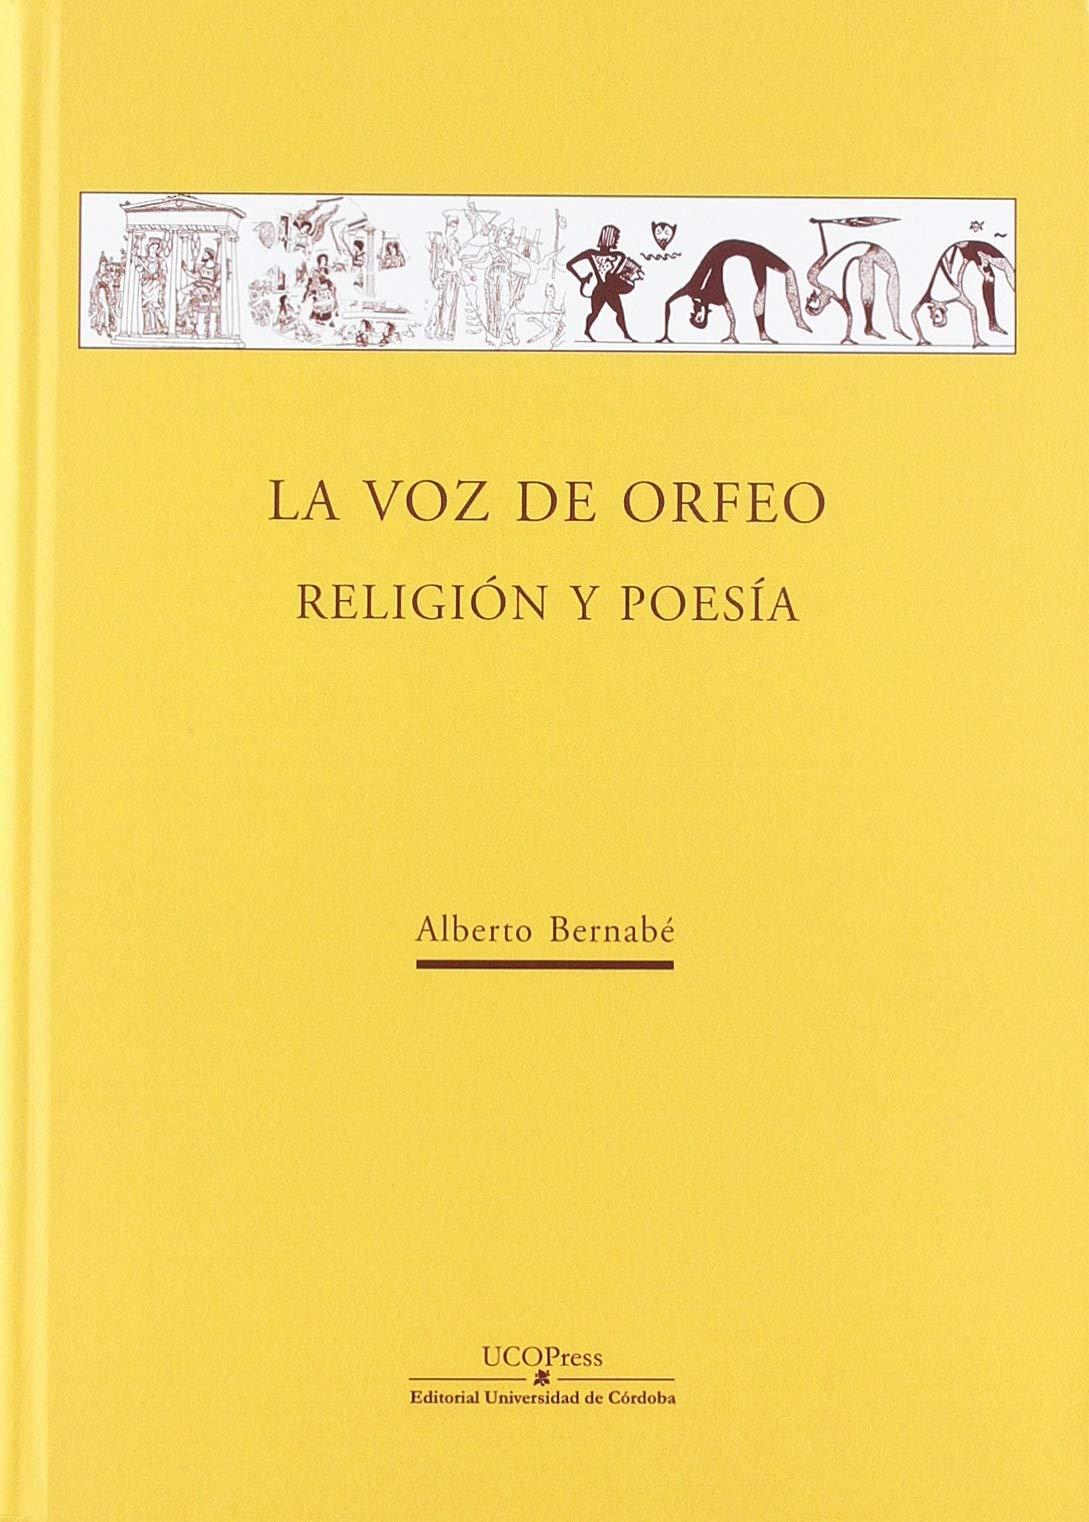 ENTREVISTA ALBERTO BERNABÉ 3